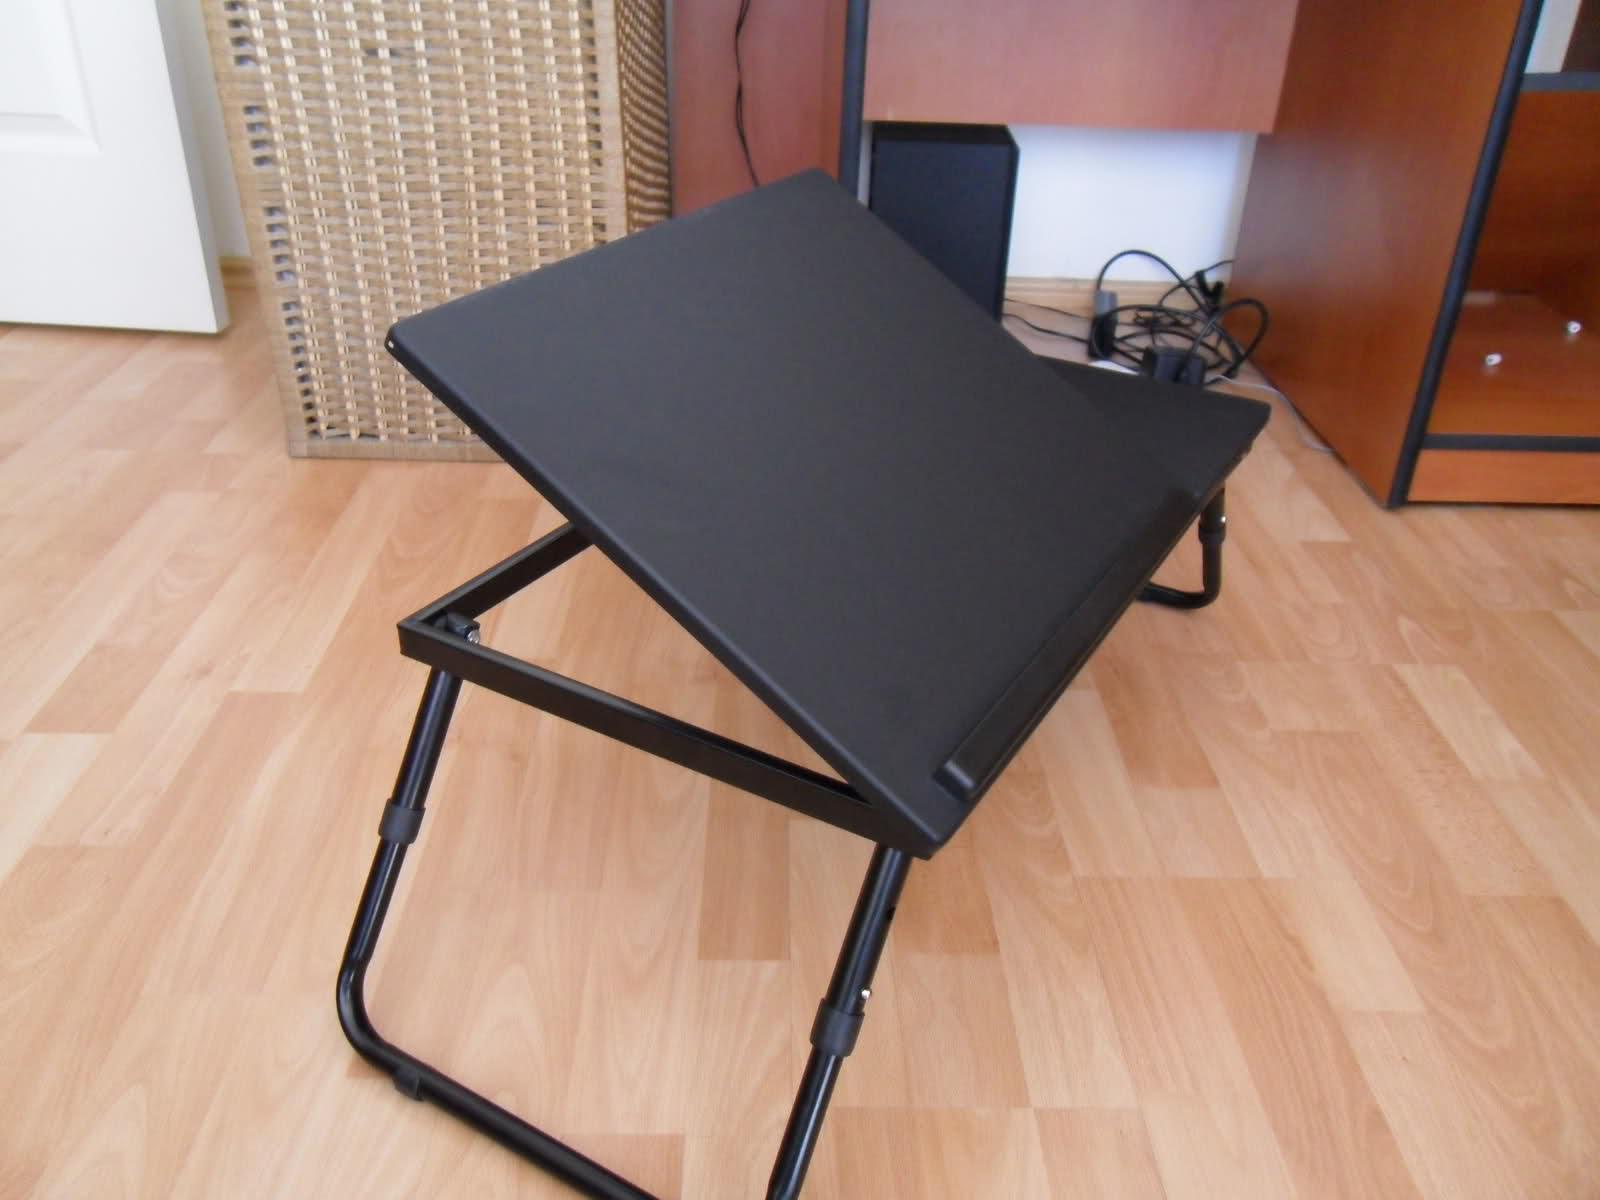 Super Kullanisli Laptop Sehpasi 50tl